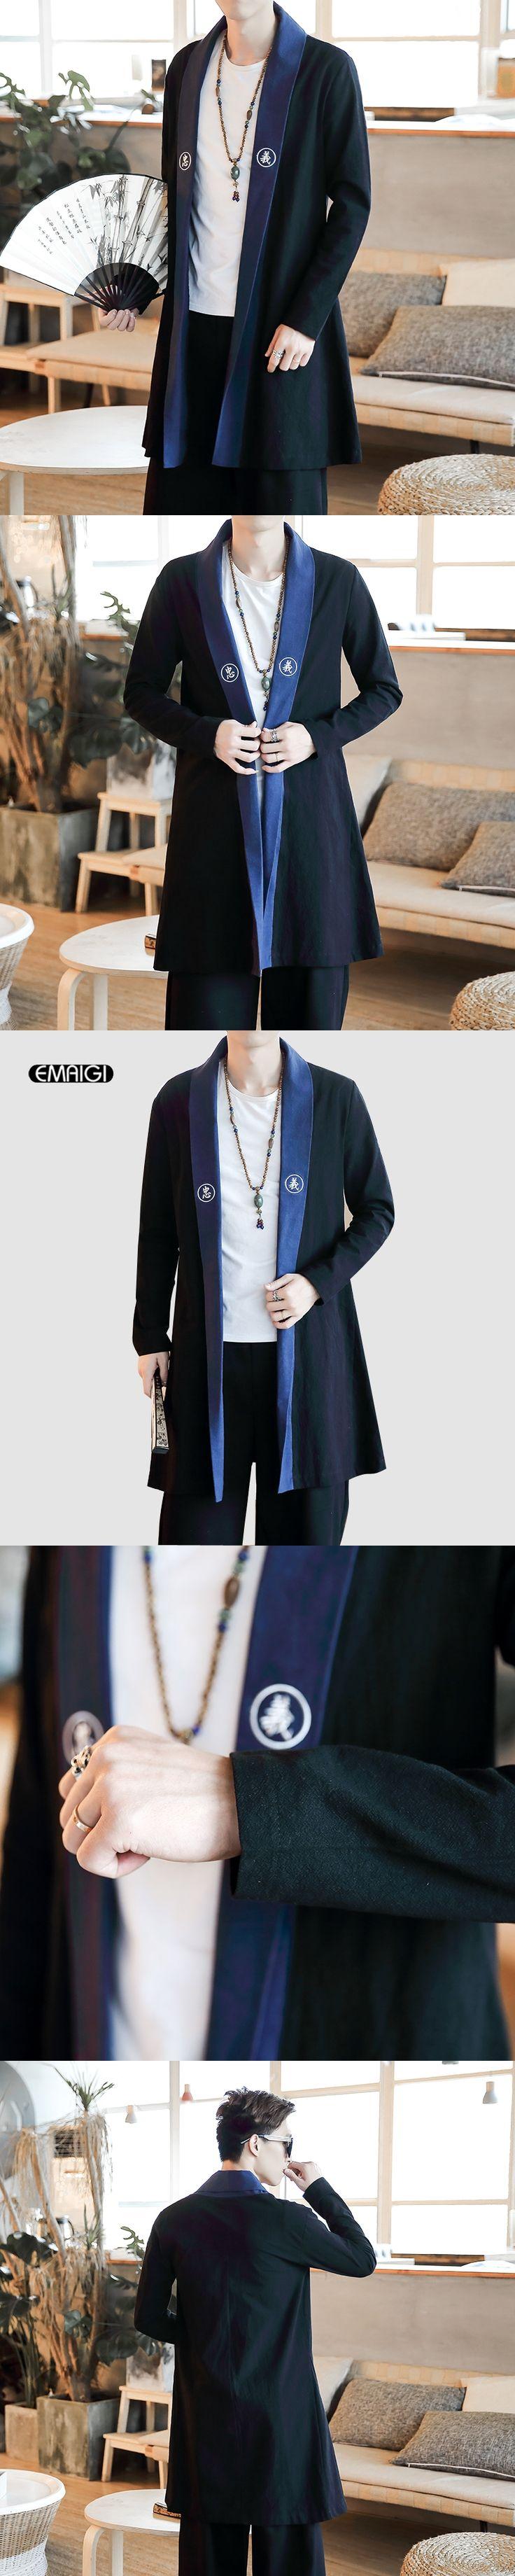 Men Cotton Linen Long Slim Fit Coat Chinese Style Robes Jacket Kimono Male Cardigan Overcoat